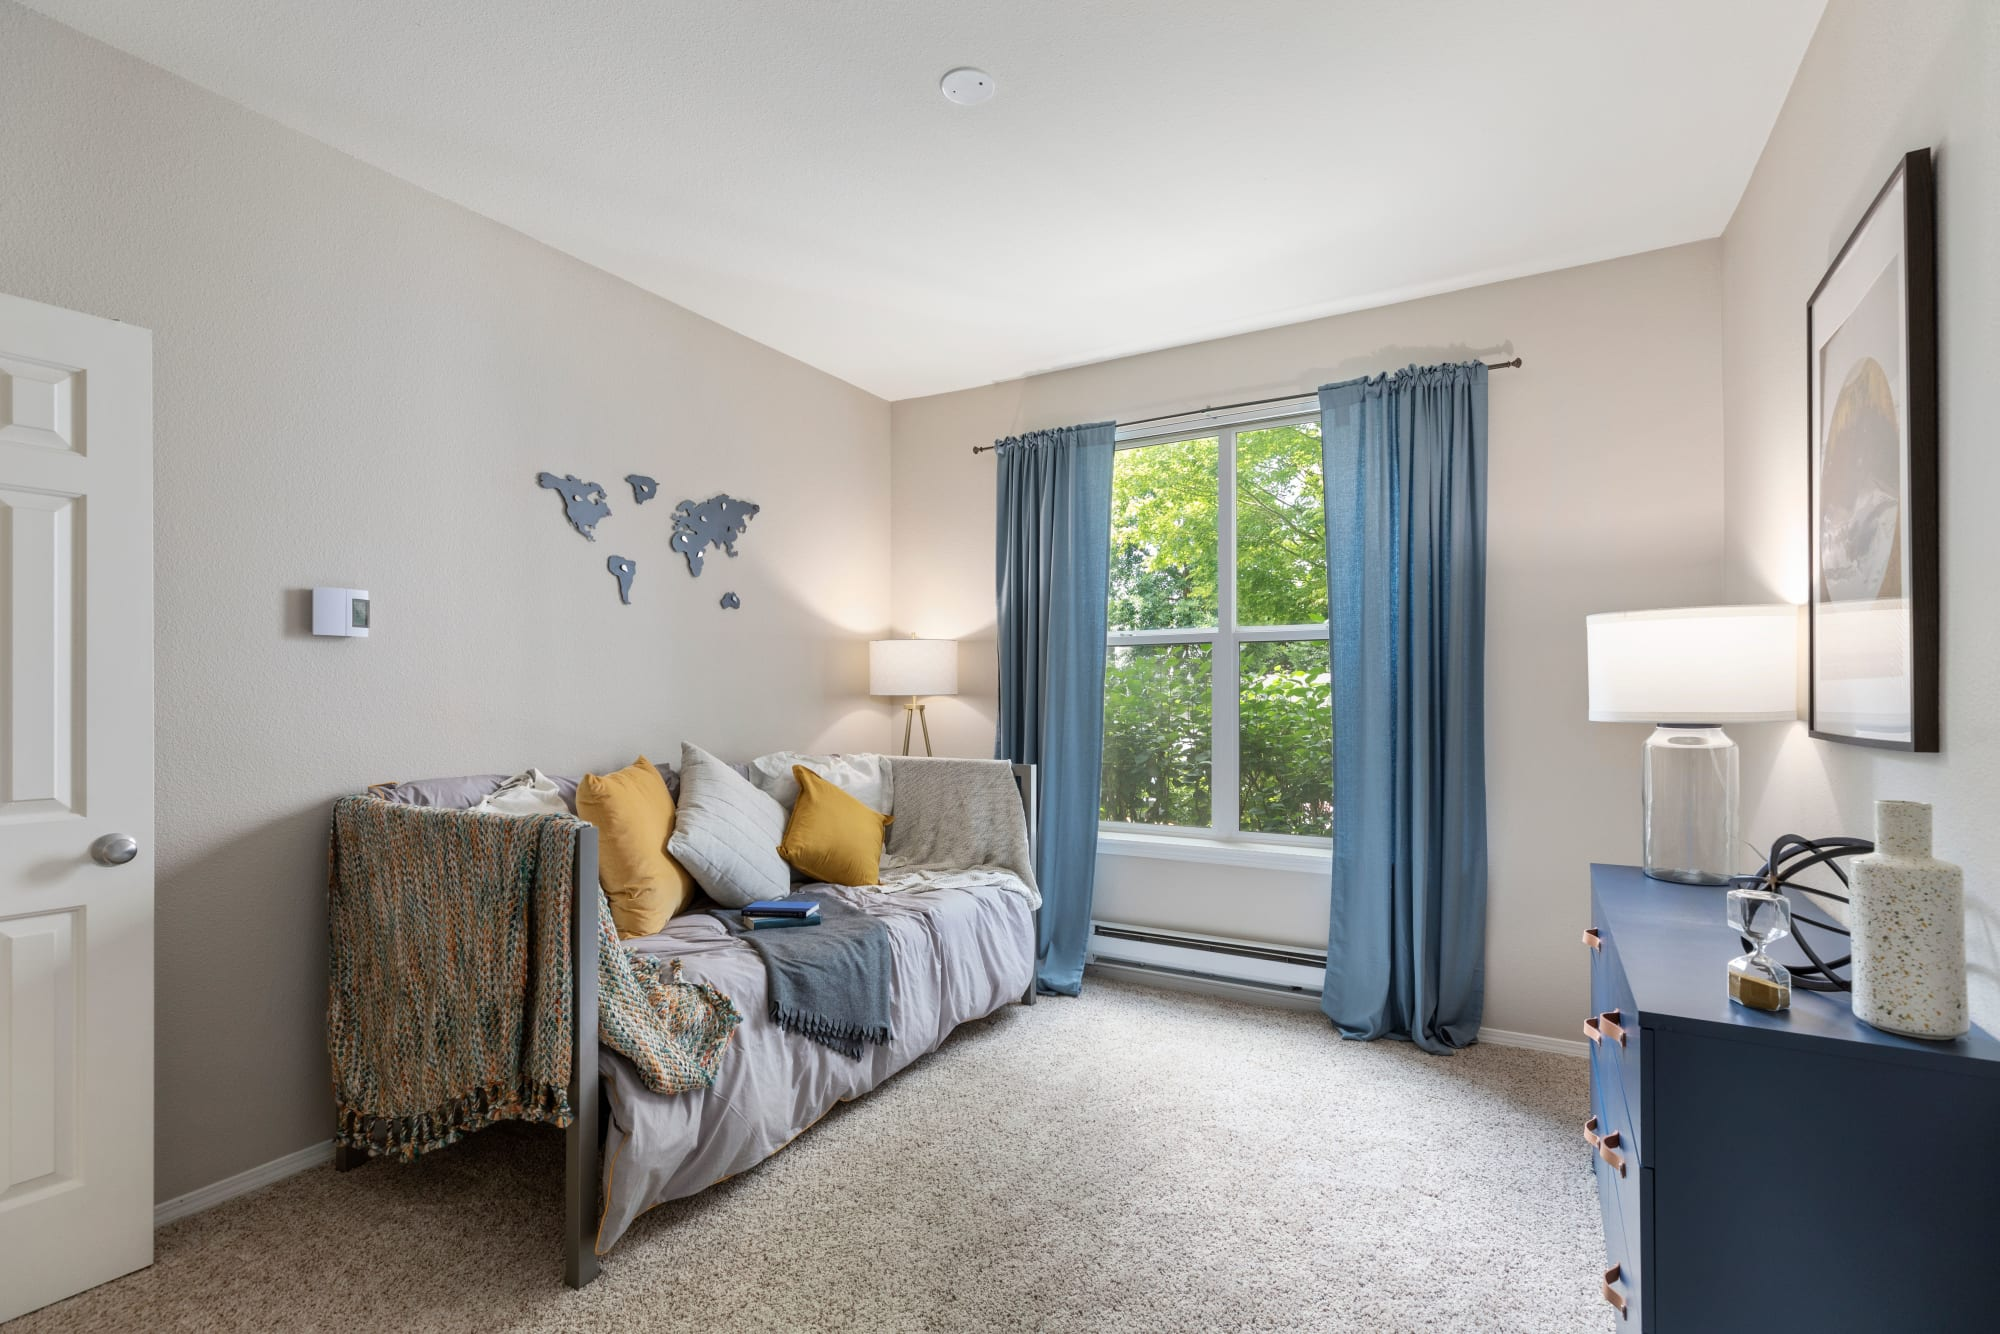 Guest bedroom at HighGrove Apartments in Everett, Washington